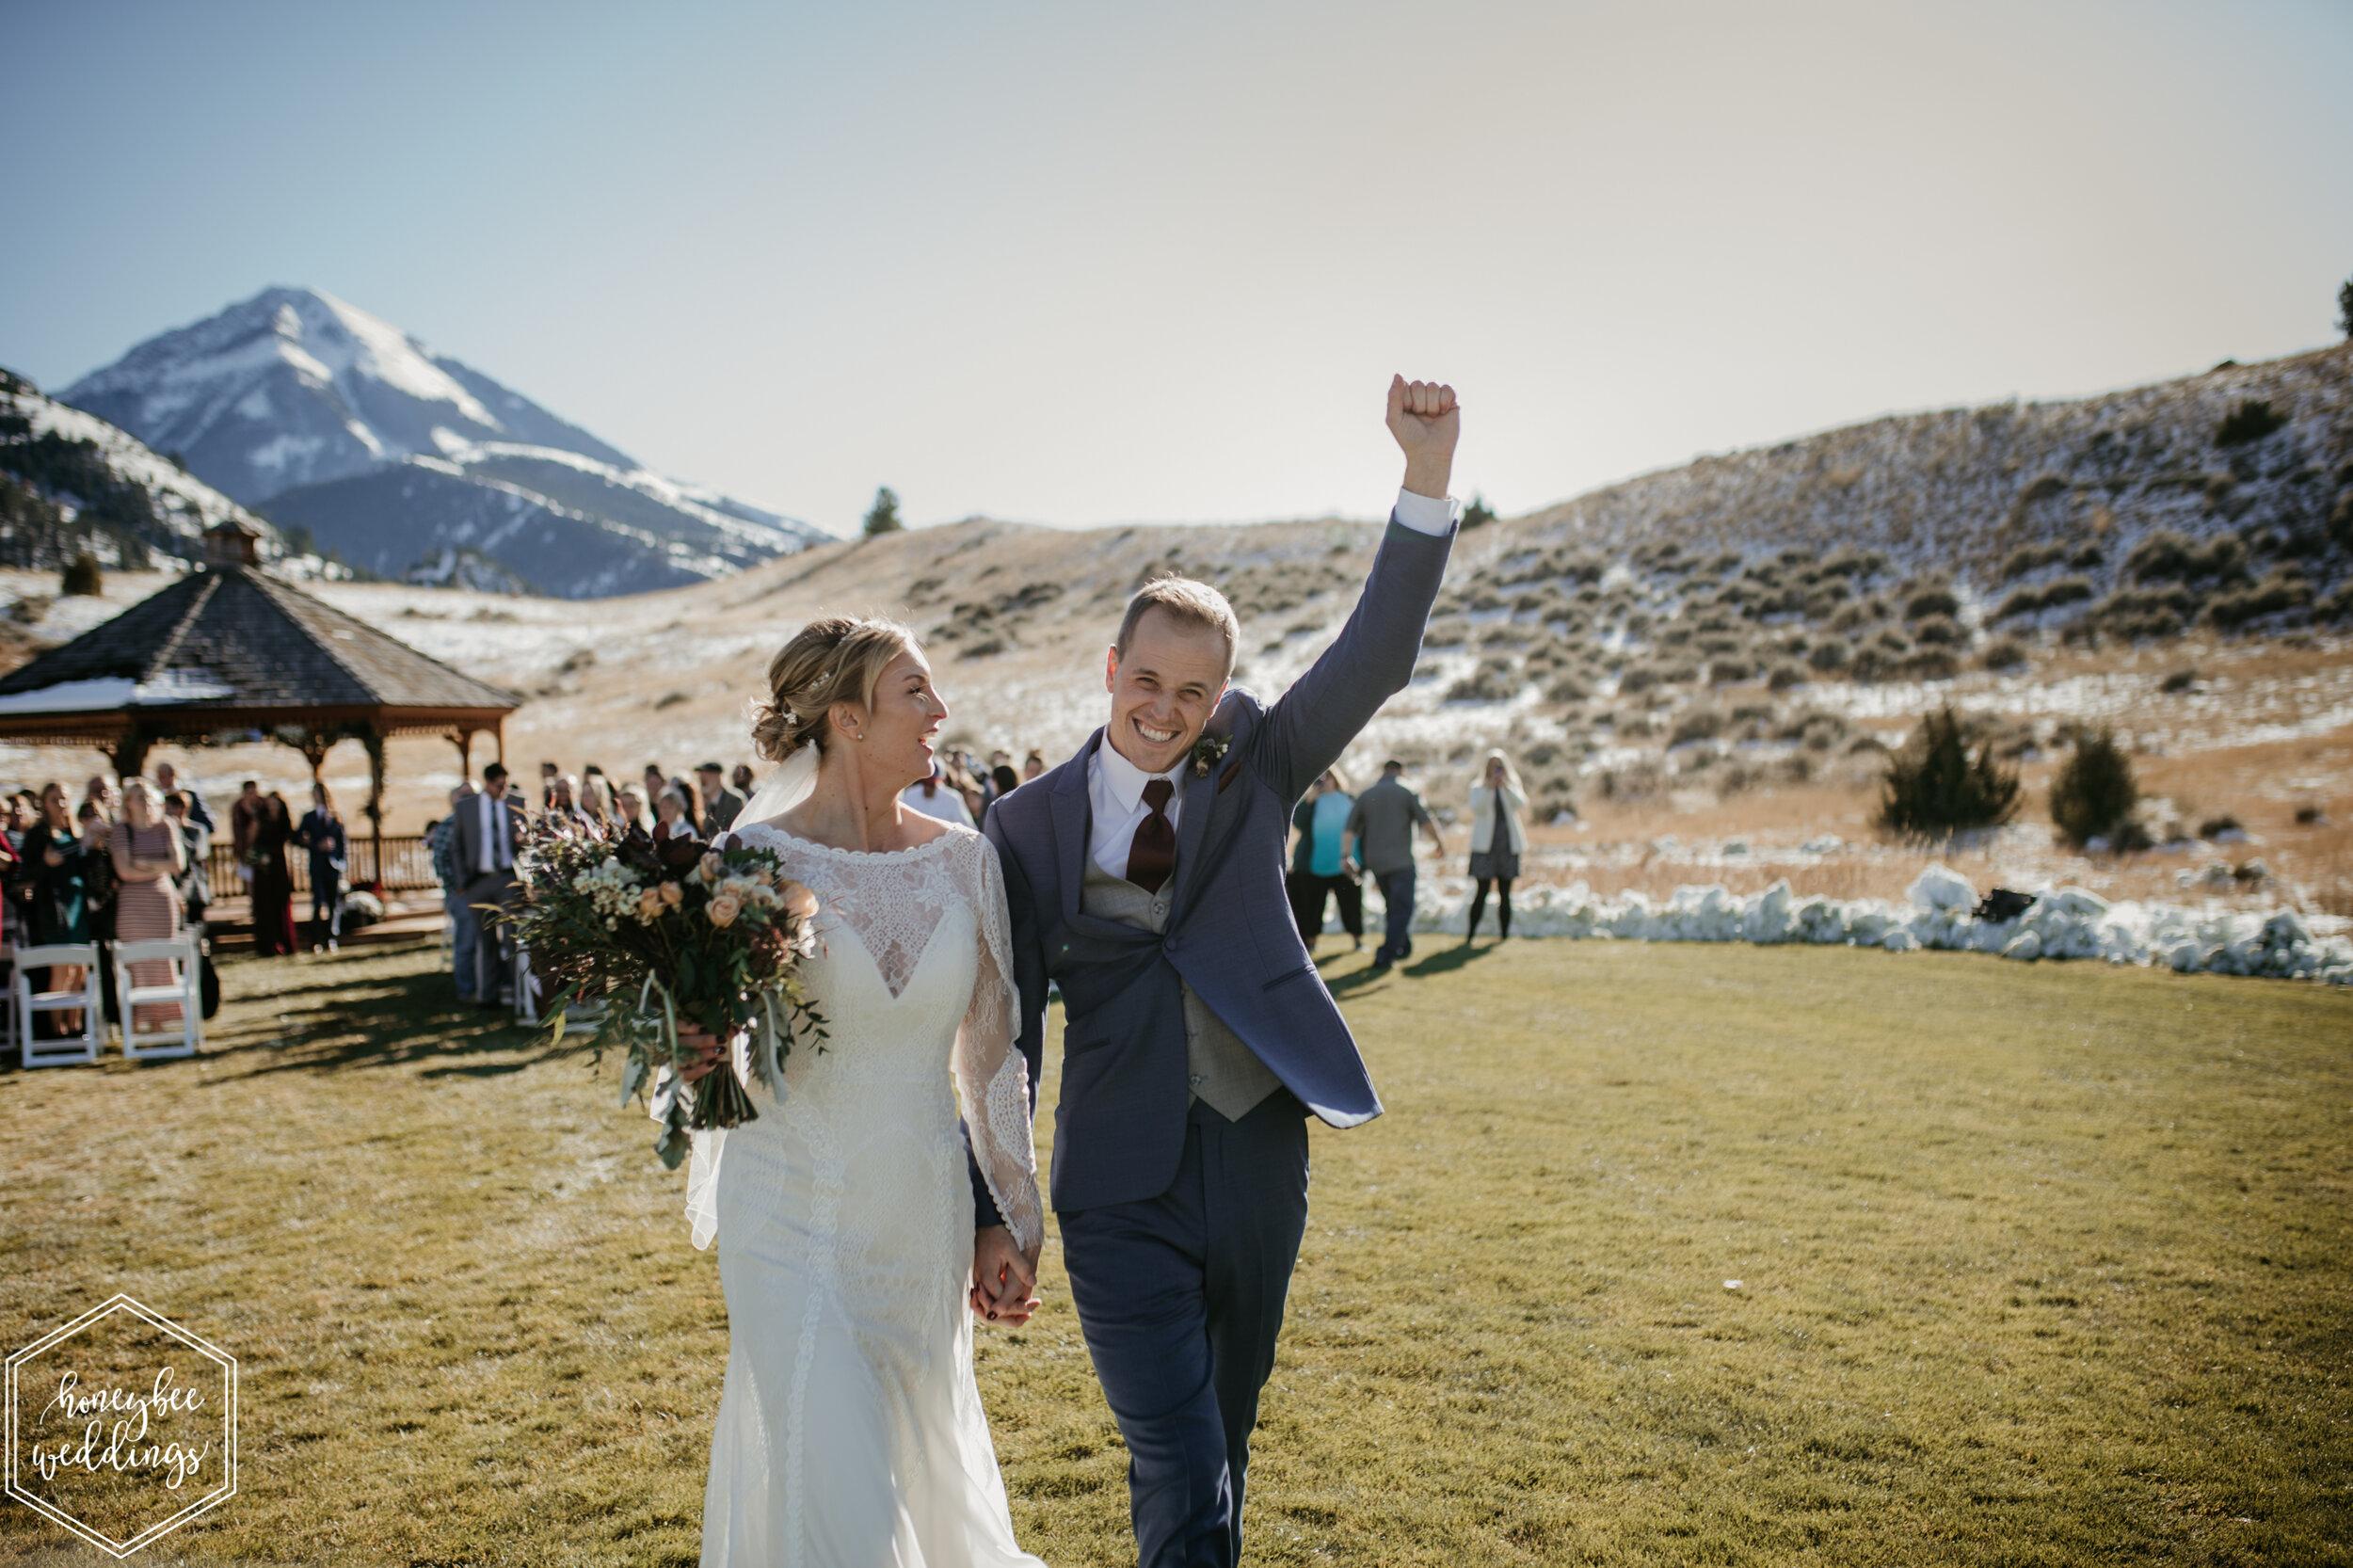 132Chico Hot Springs Wedding_Montana Wedding Photographer_Winter Wedding_Ariel & Richard_October 12, 2019-1573.jpg